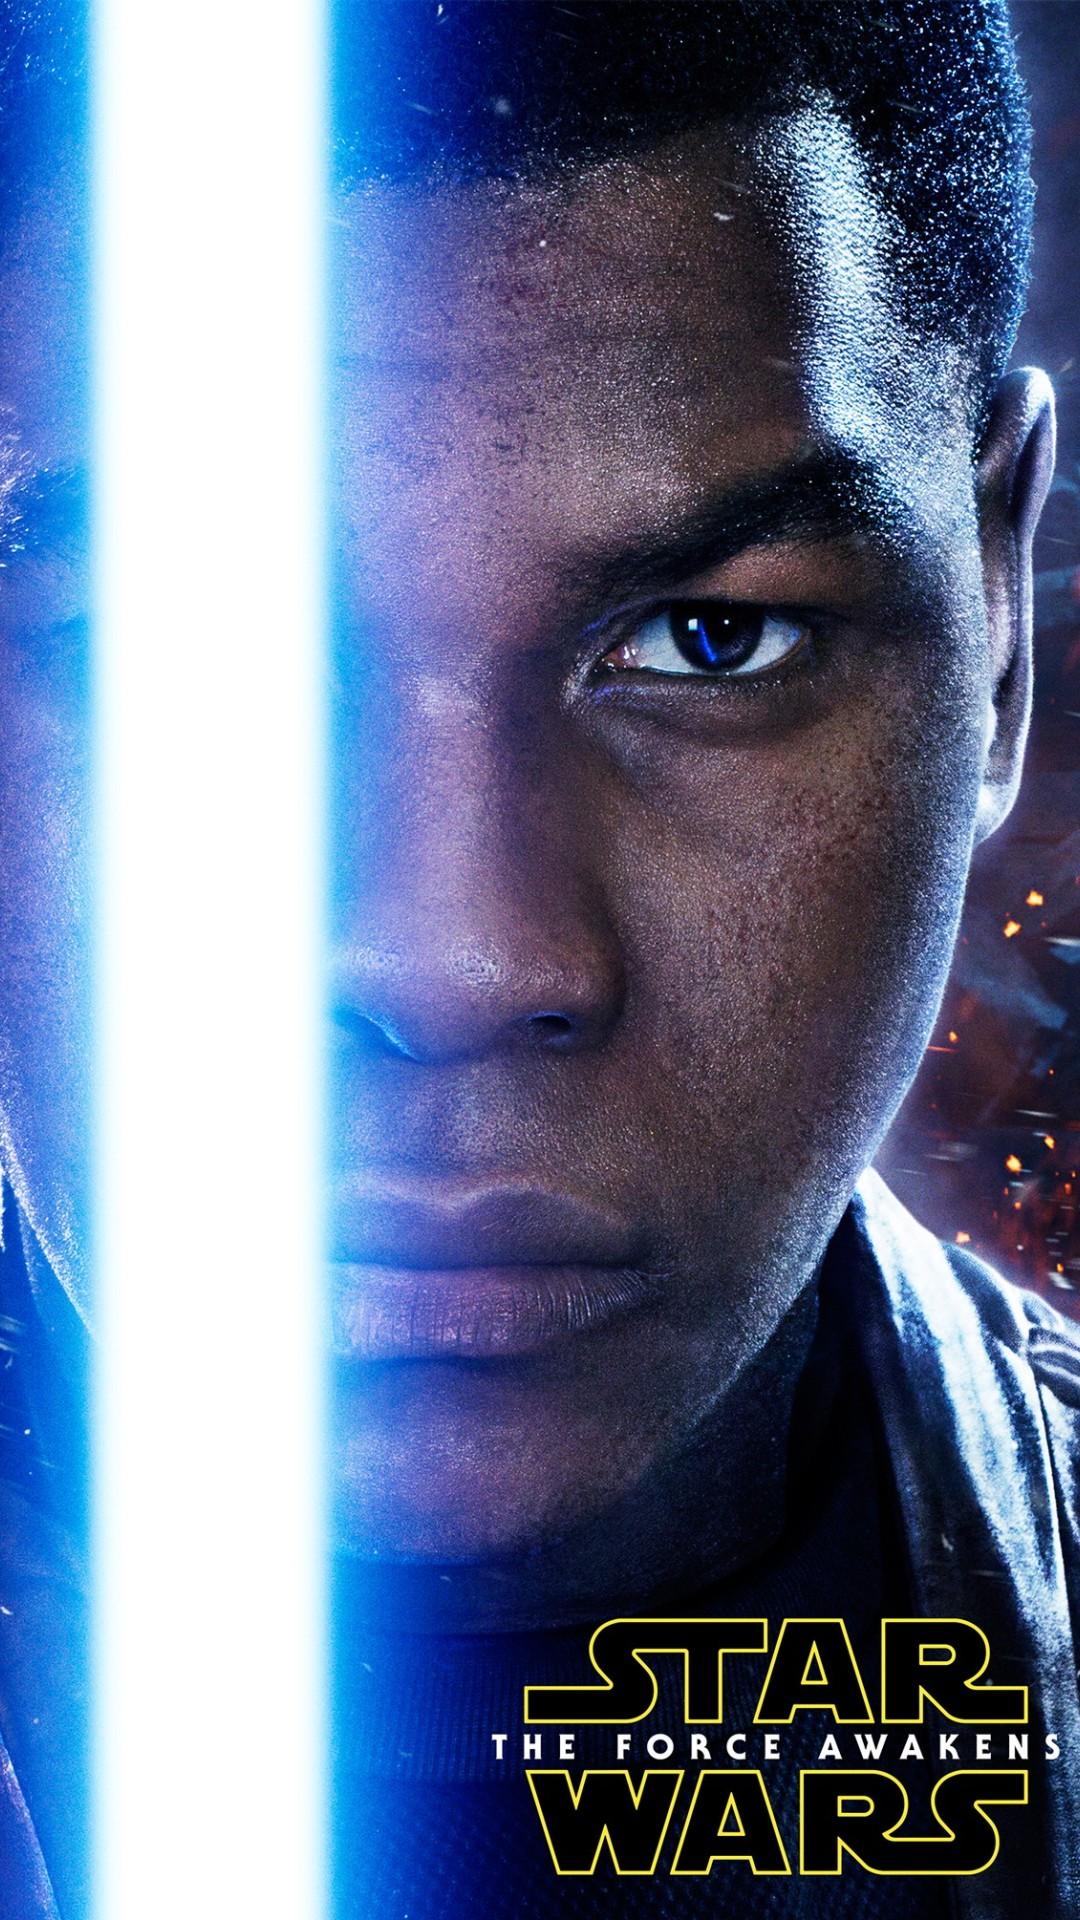 John Boyega As Finn Star Wars 2015 Wallpapers 1080x1920 589838